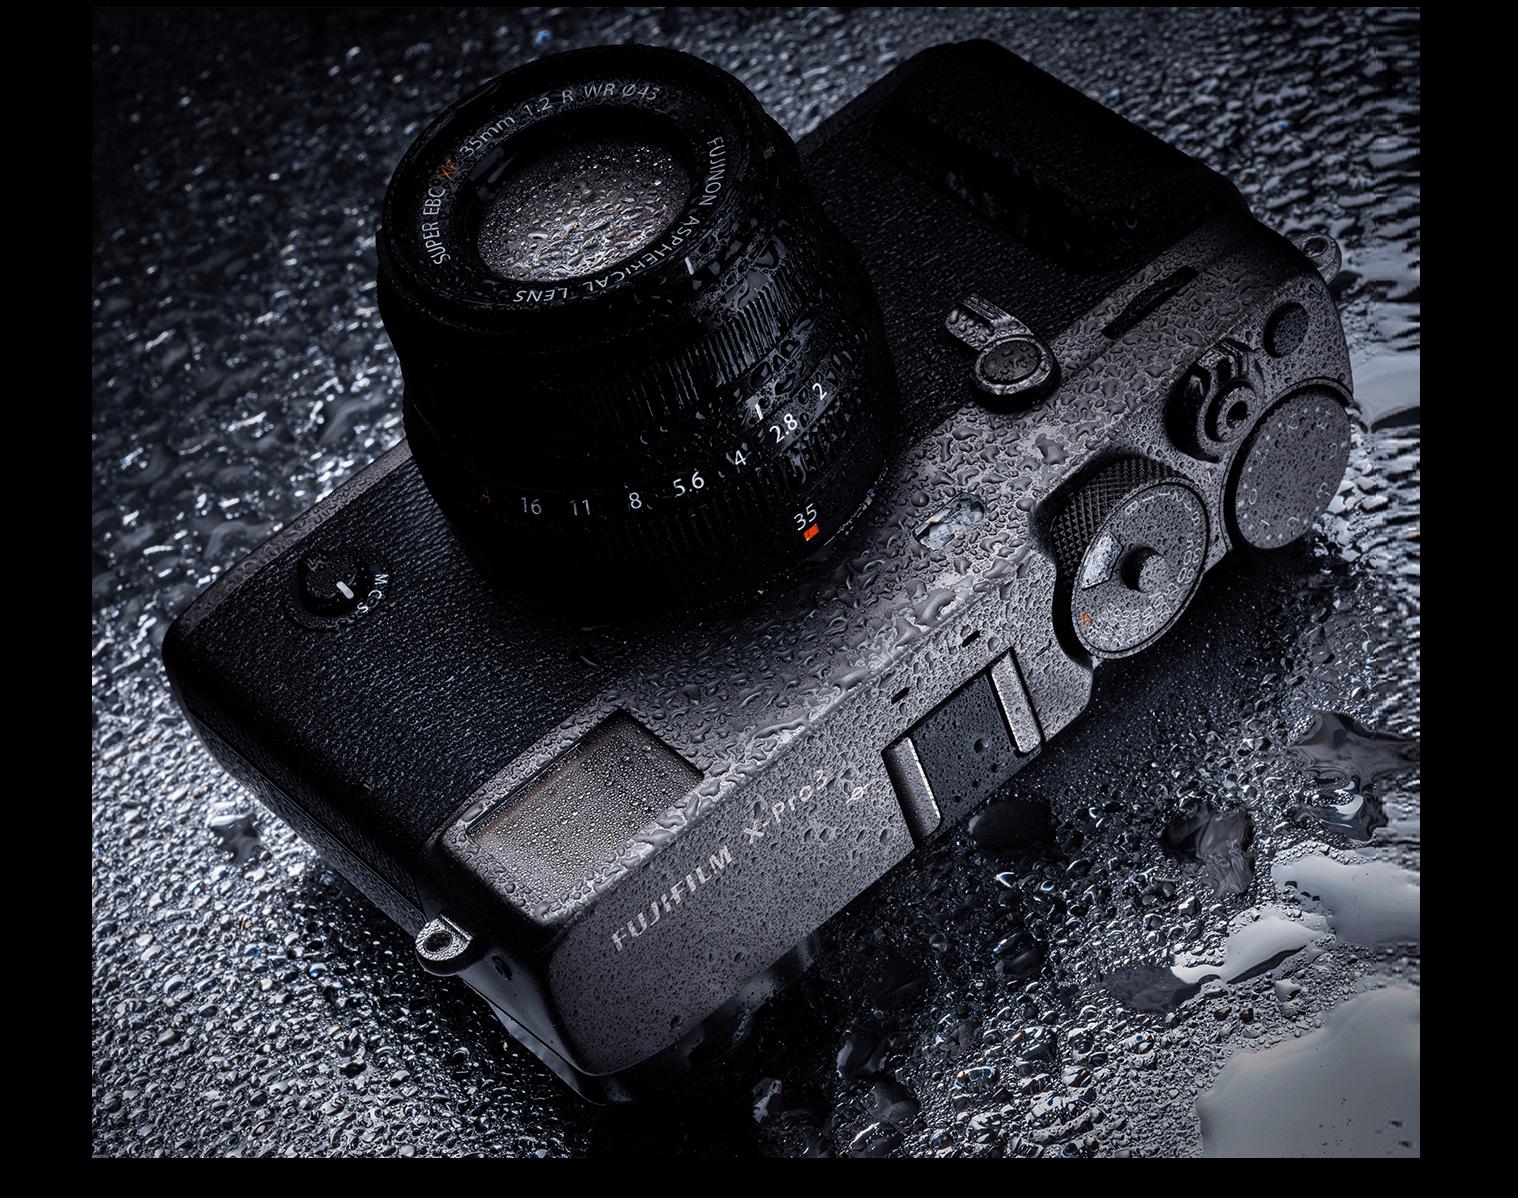 body_camera_03-1